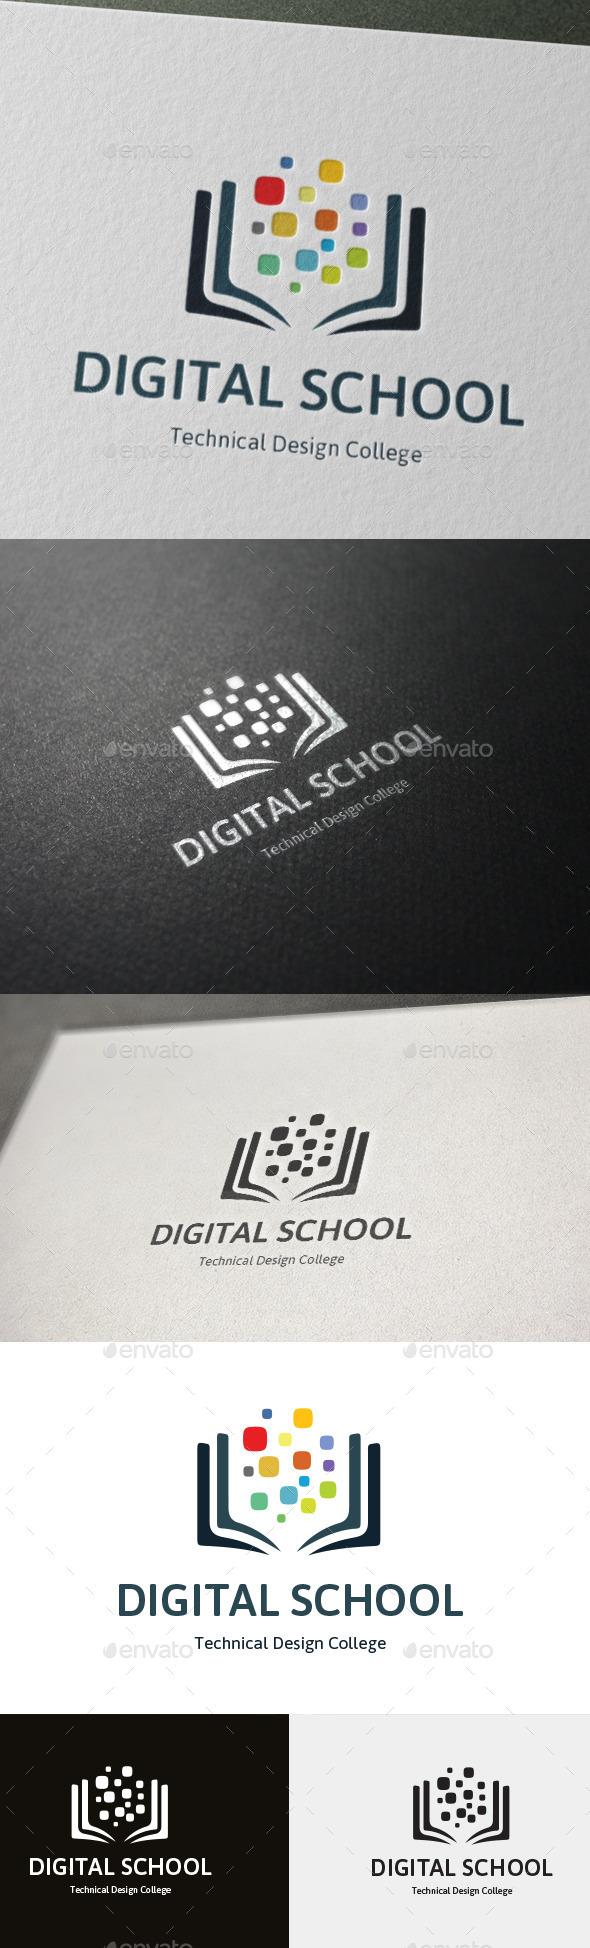 Technical Design College Logo Digital School - College Logo Templates